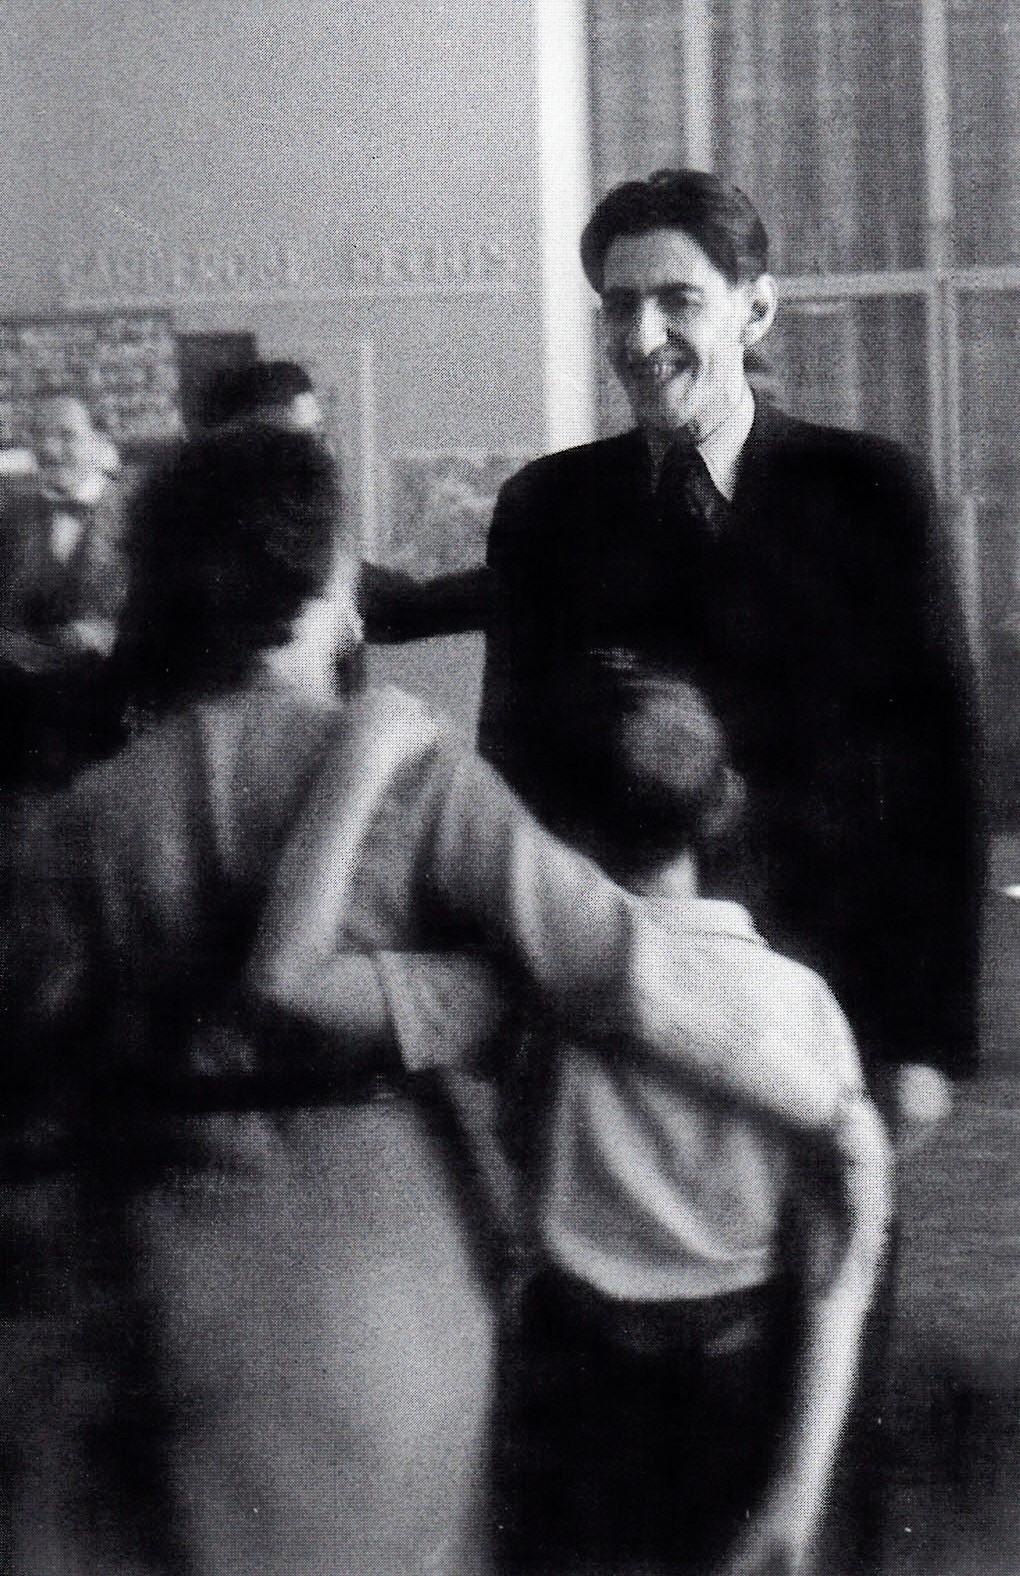 Bernfeld u. Alice Balint ? IPV-Kongress 1934, Luzern